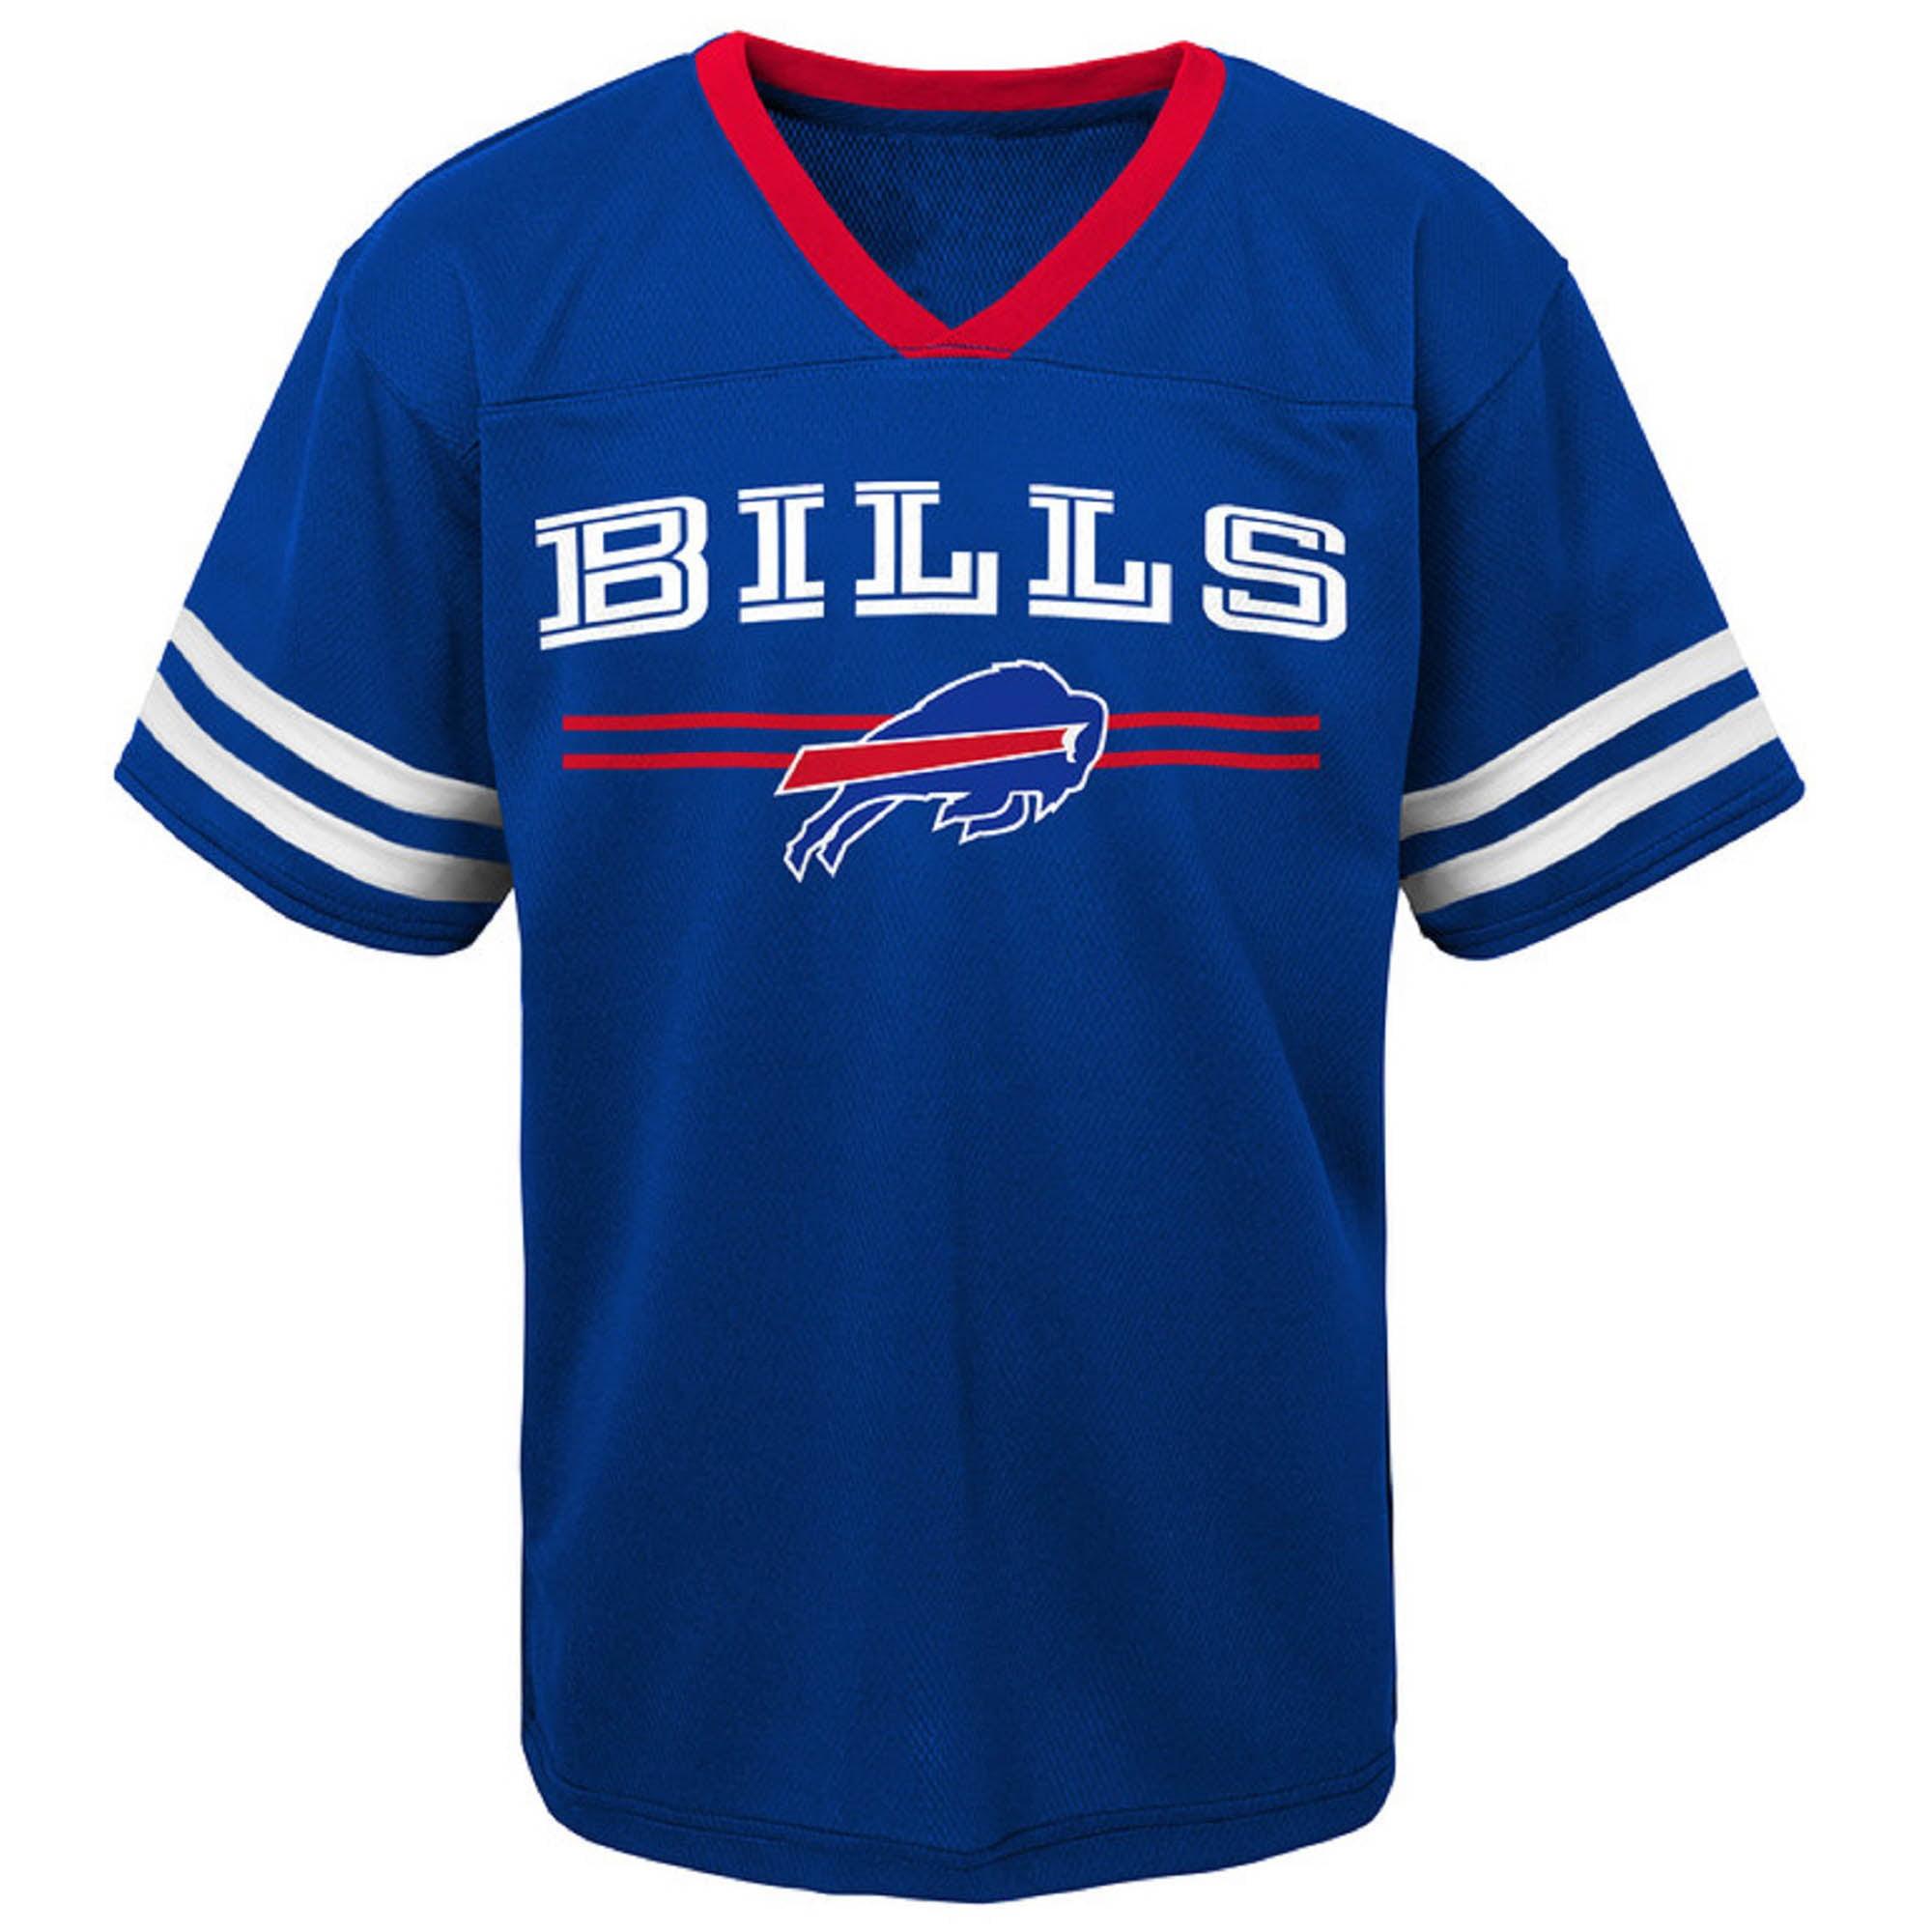 Toddler Royal Buffalo Bills Mesh Jersey V-Neck T-Shirt